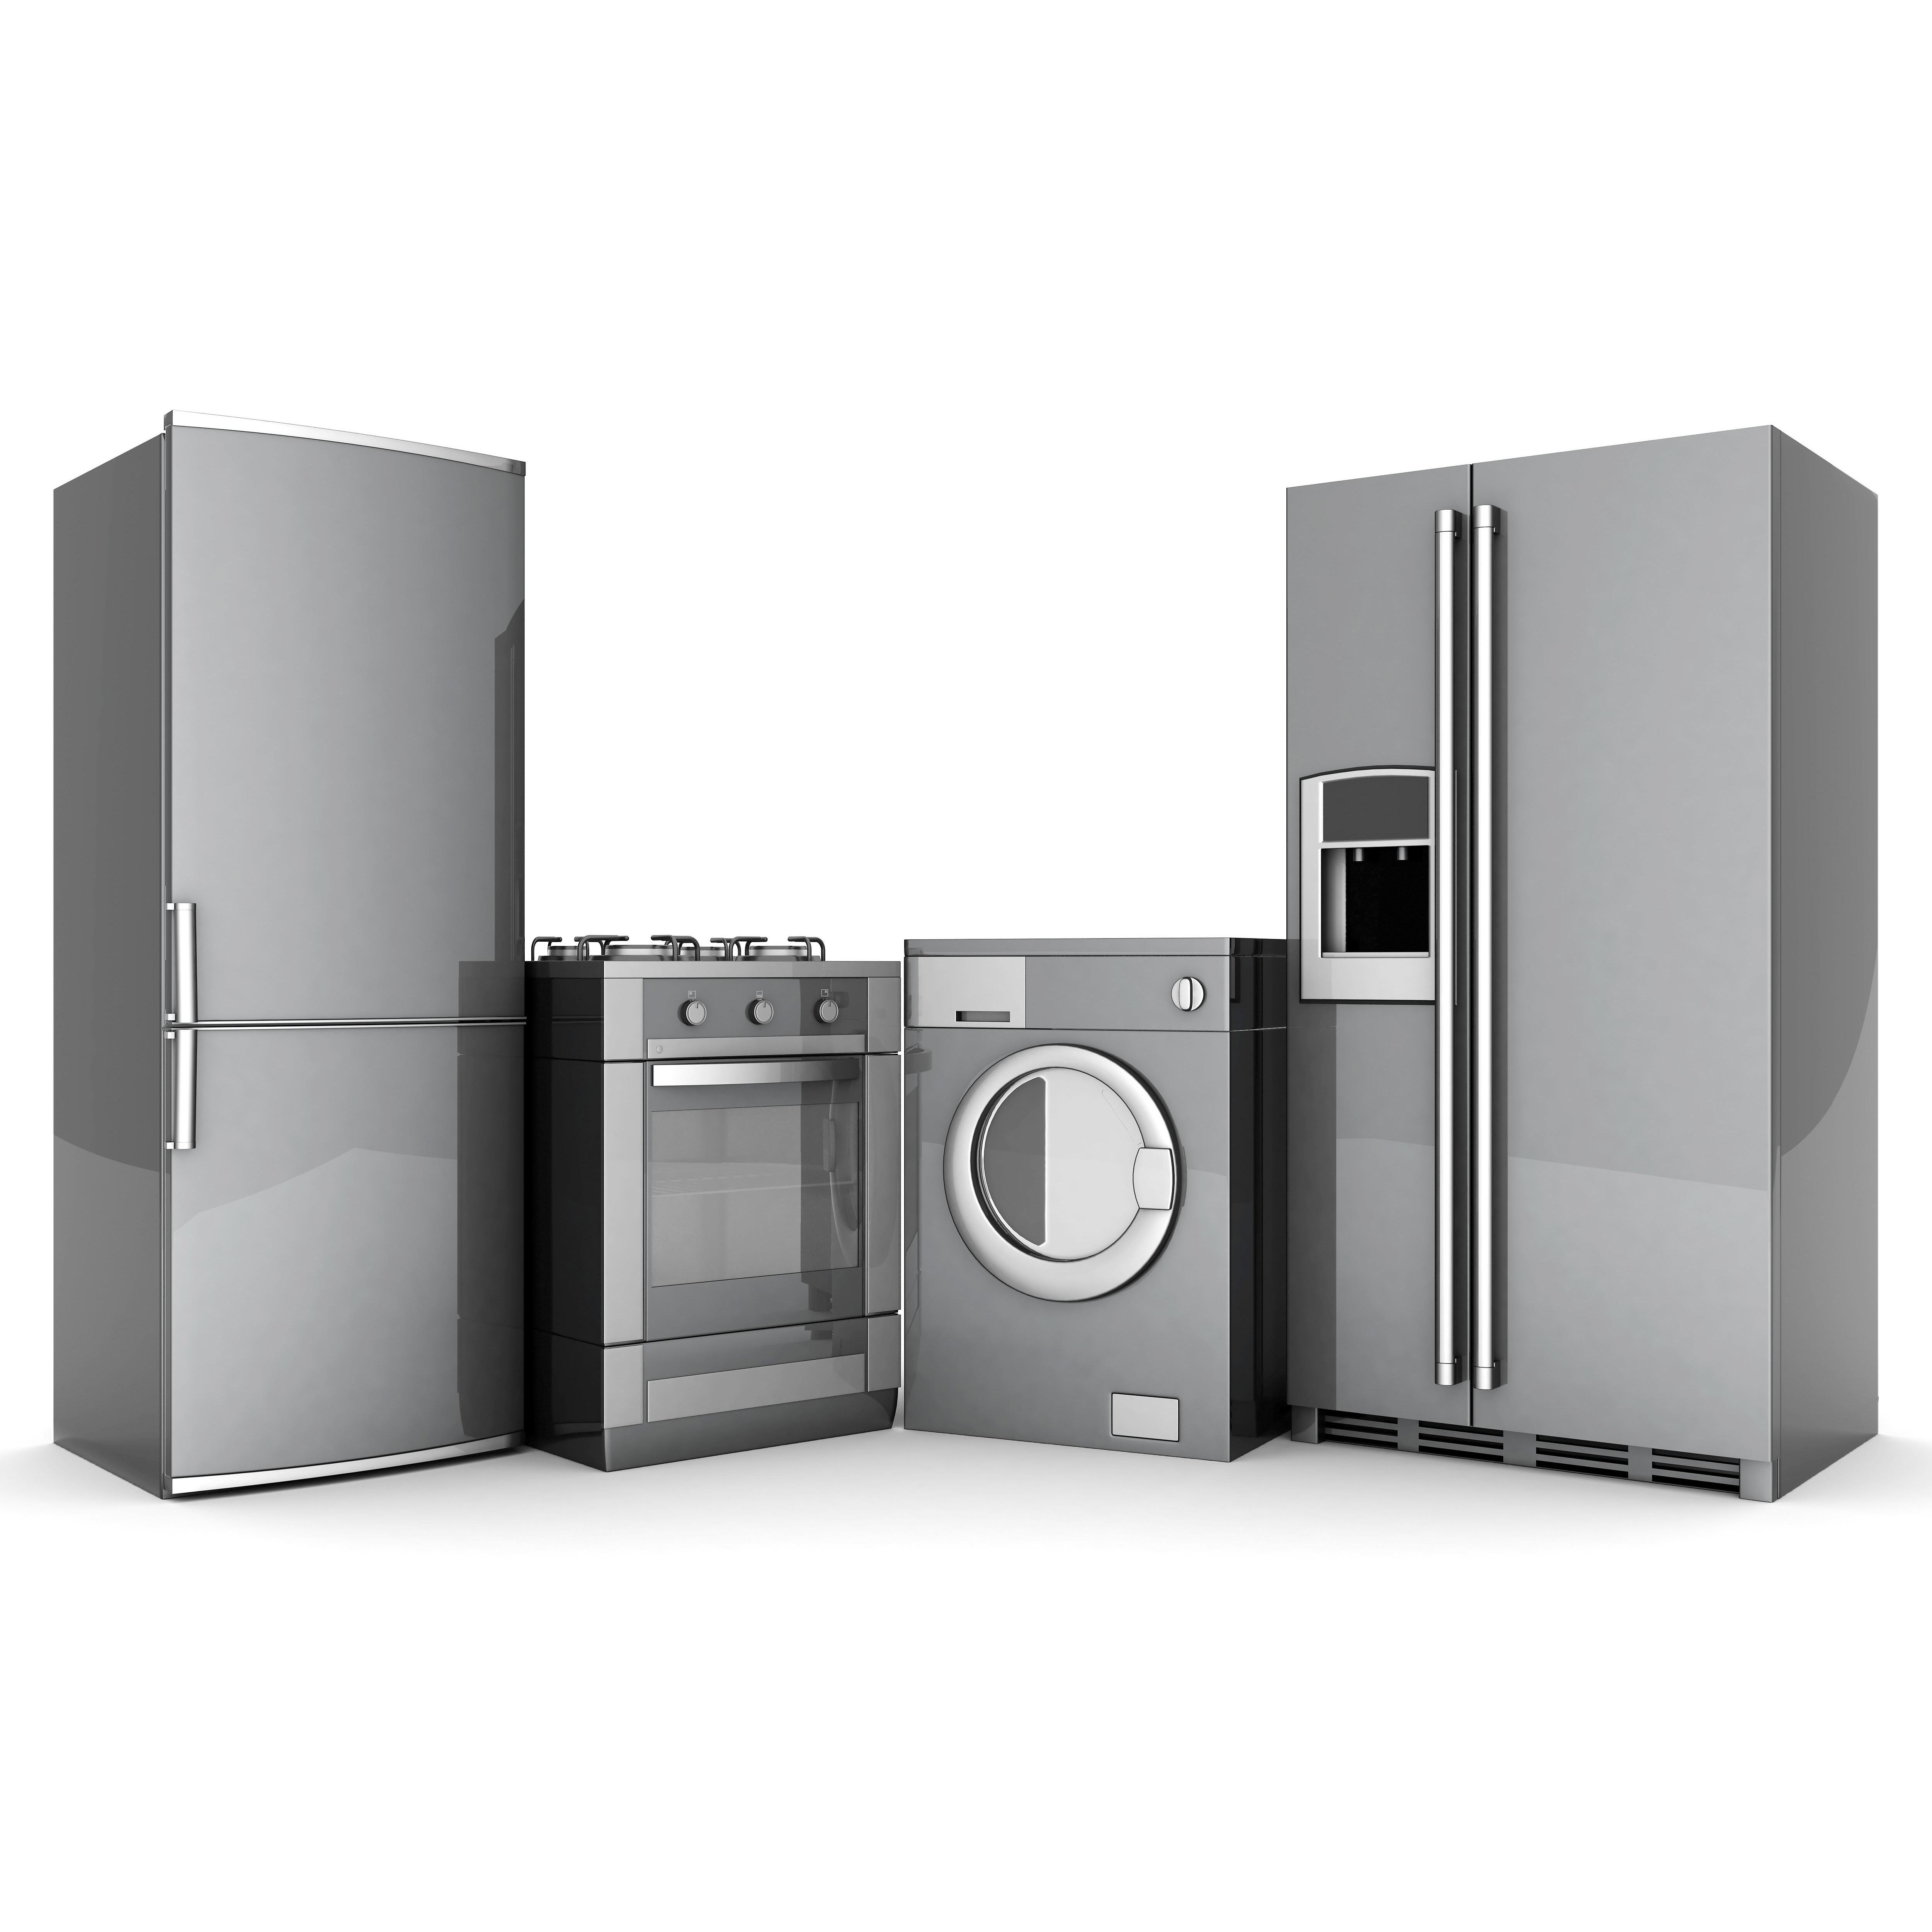 Express Appliance Service